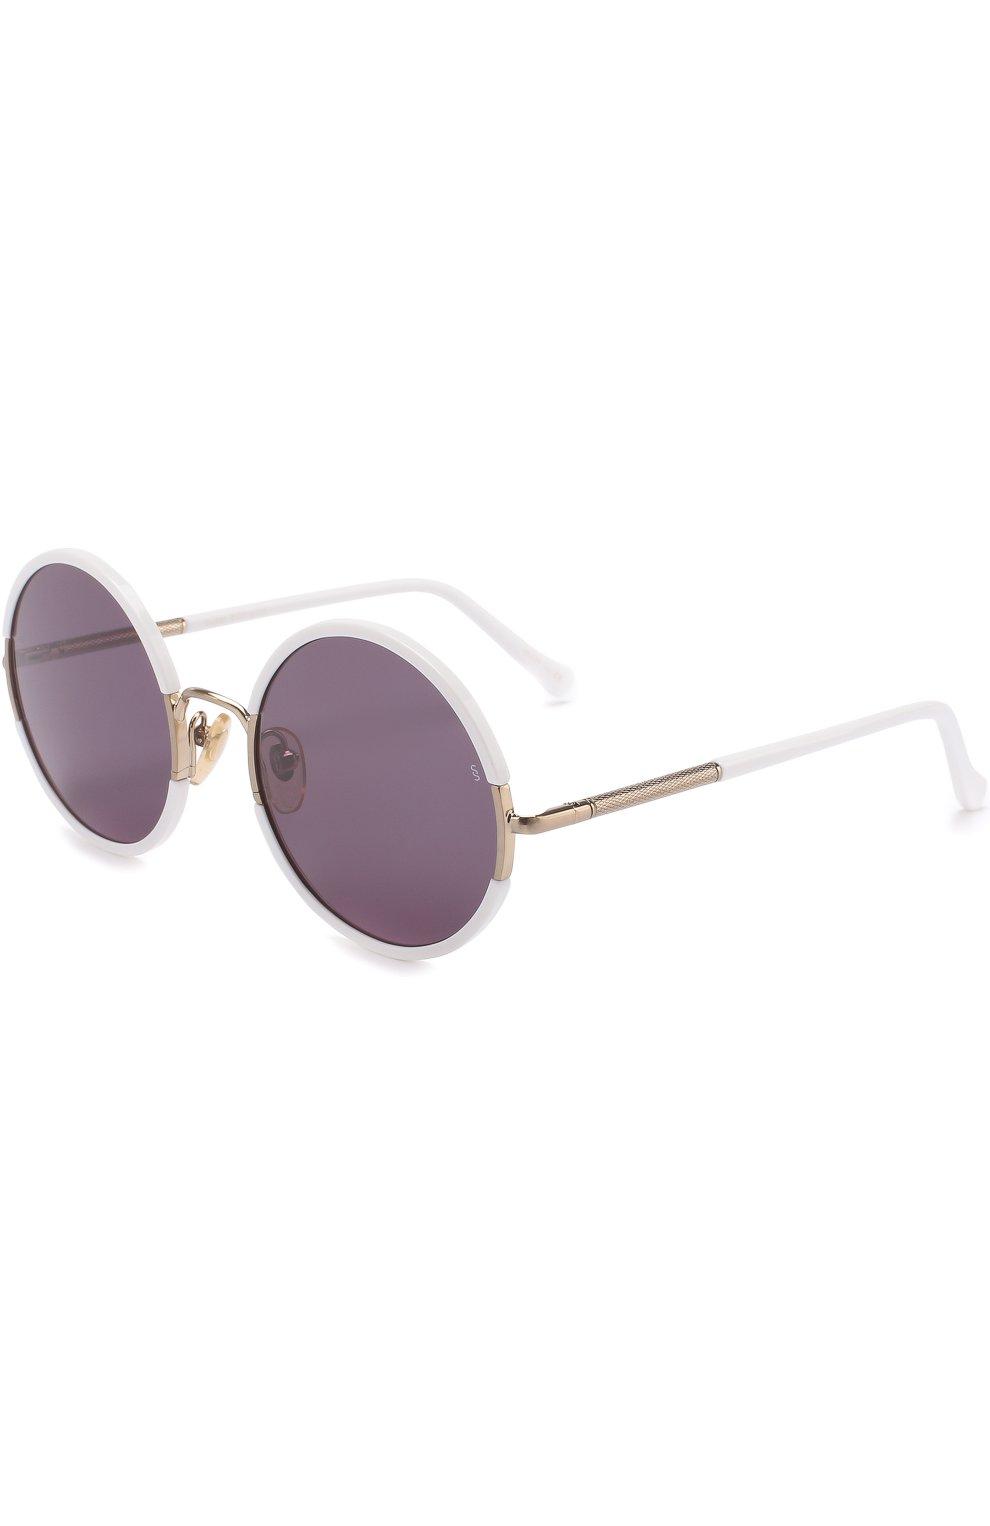 Женские солнцезащитные очки SUNDAY SOMEWHERE белого цвета, арт. YETTI-WHT | Фото 1